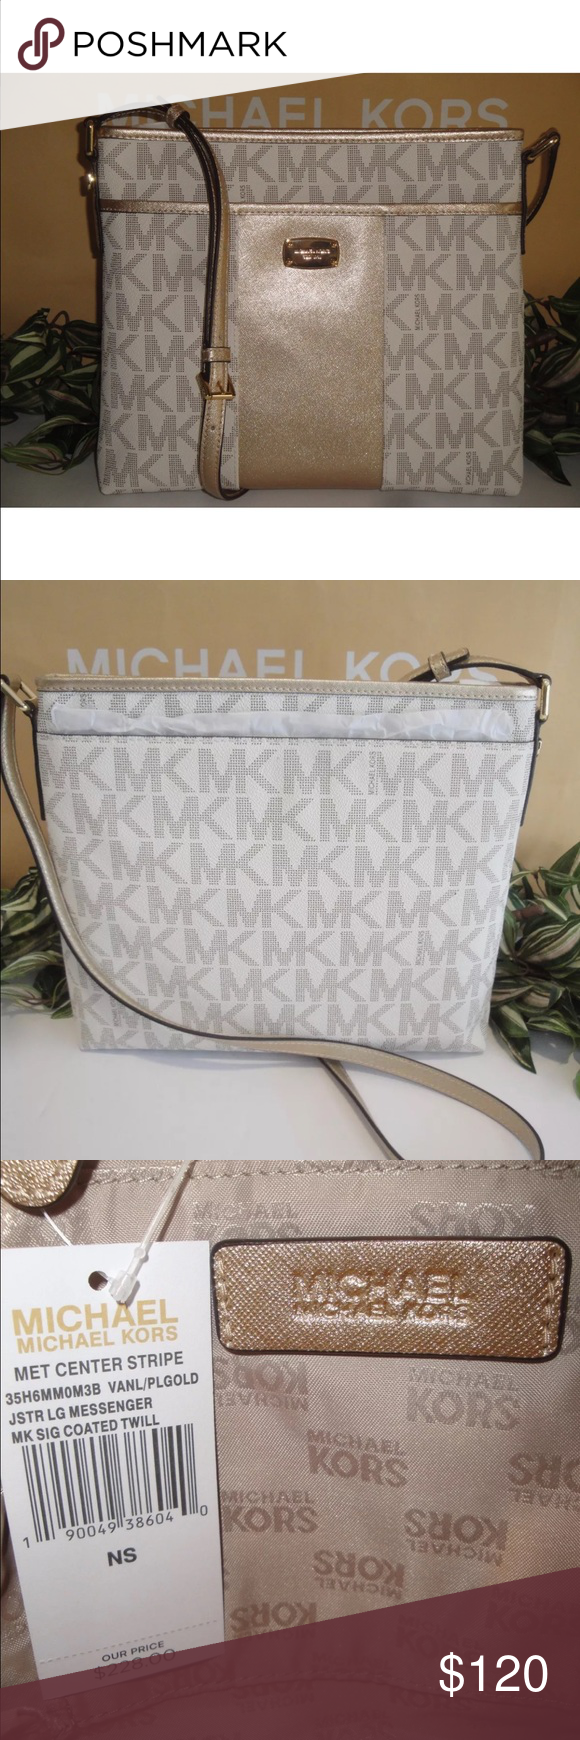 b4a0cd973f660f New Michael kors vanilla center stripe crossbody No offers. No trades Vanilla  MK Logo with